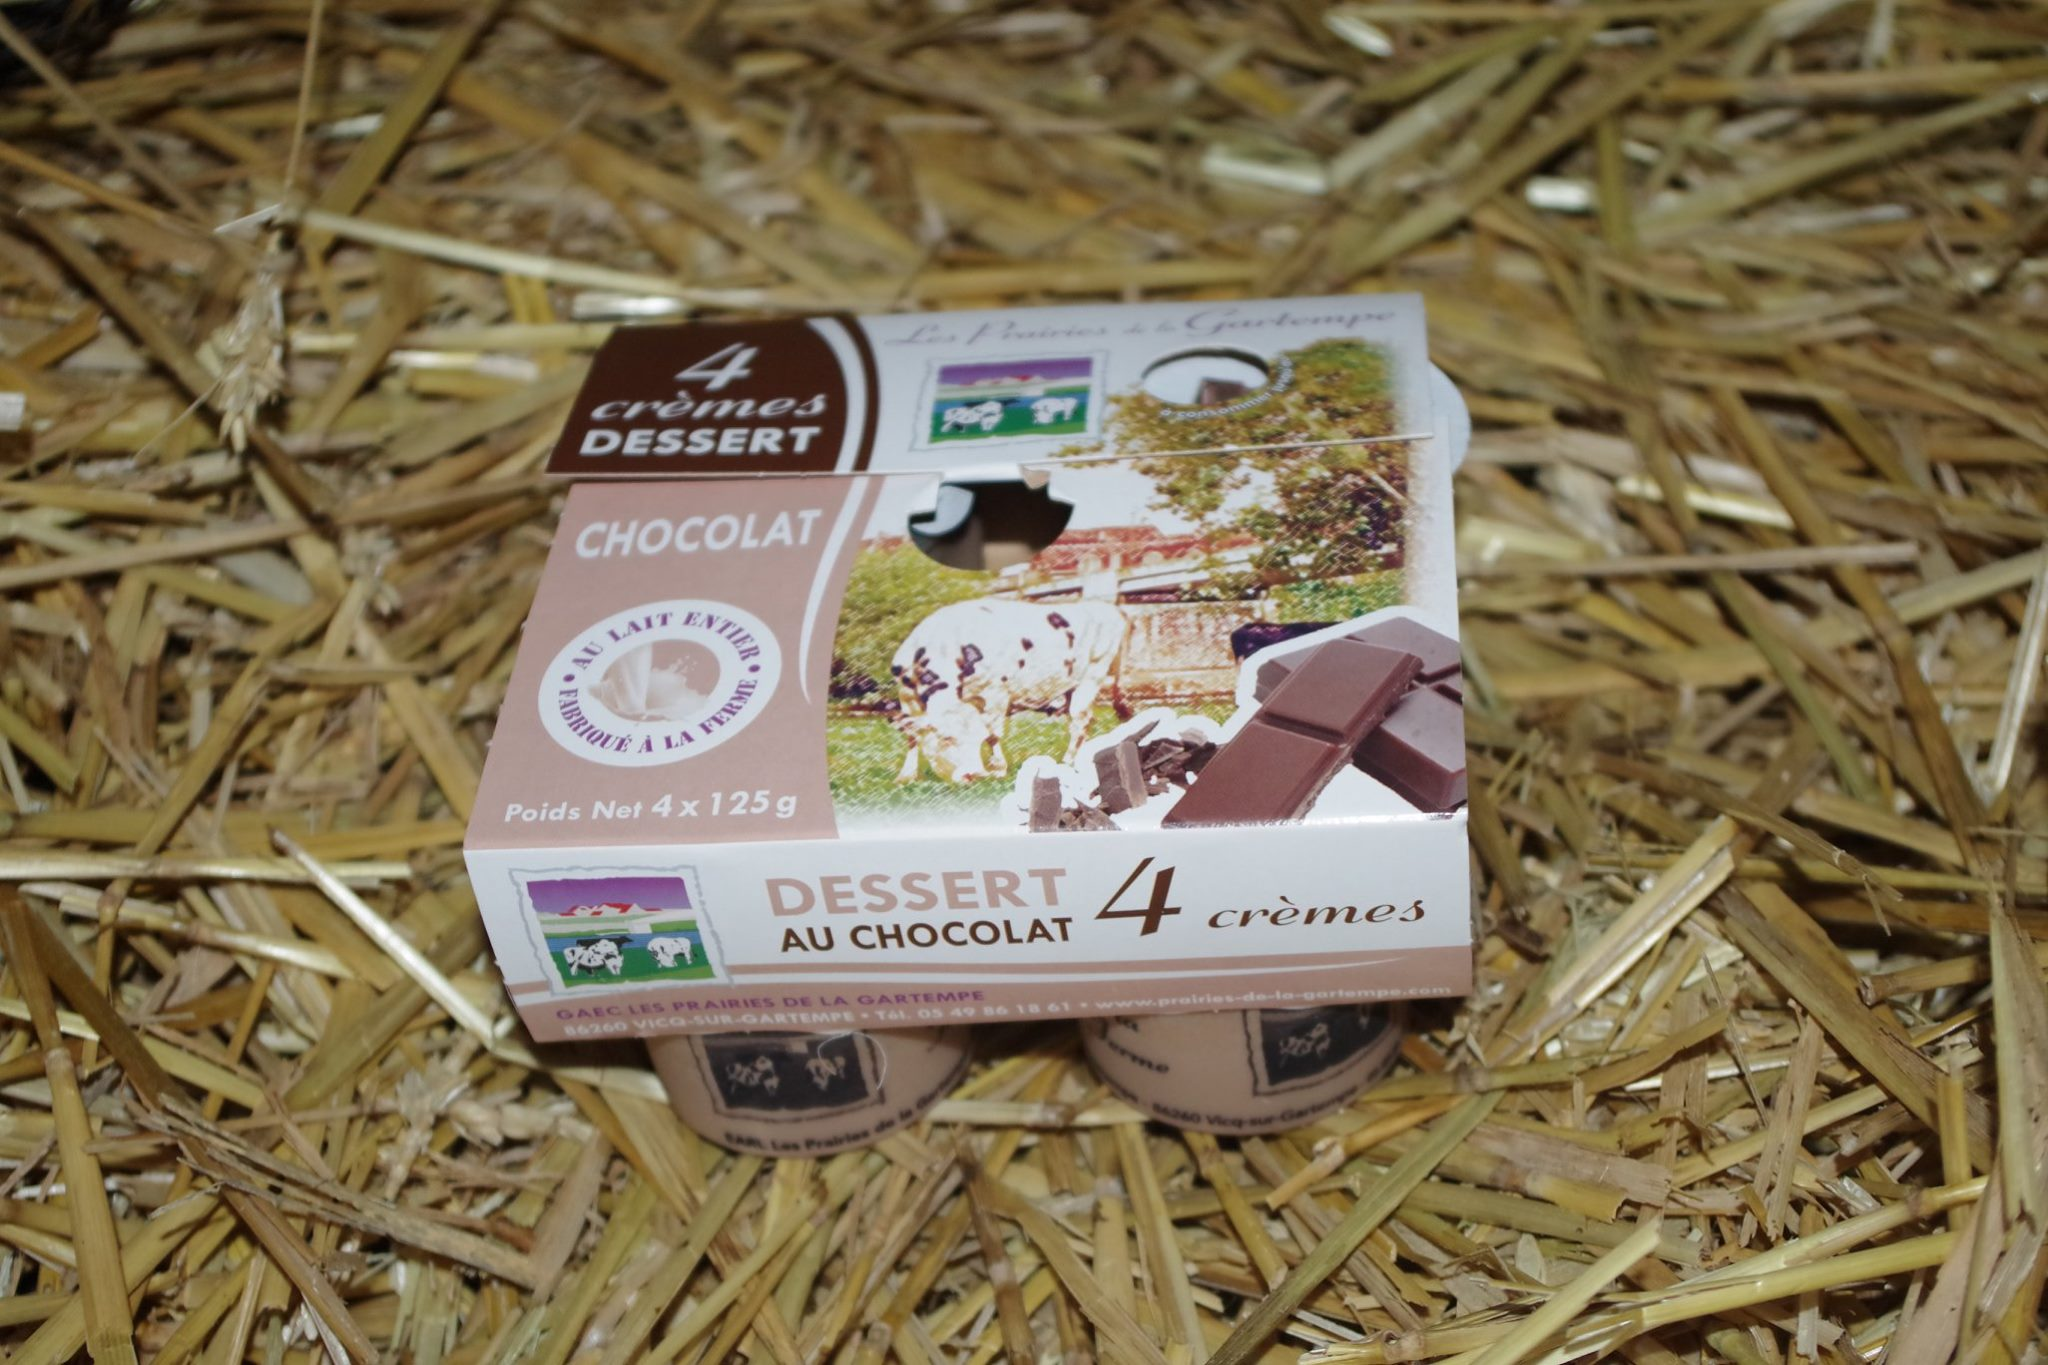 Crèmes dessert au chocolat - Click and Collect 86